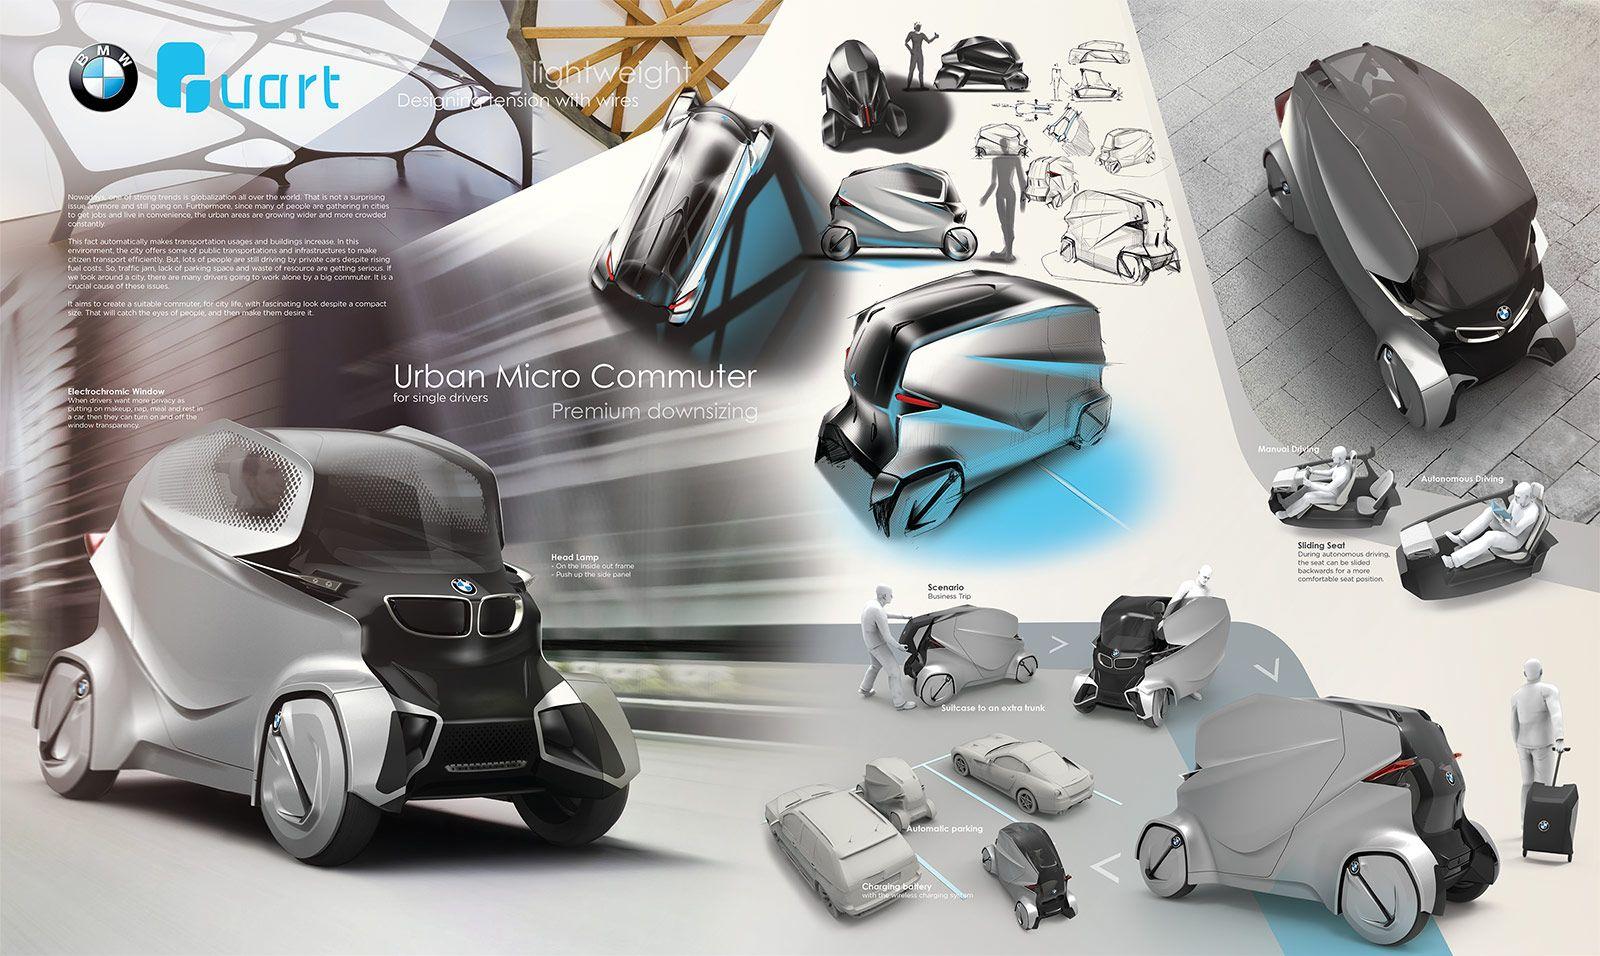 bmw quart concept by yujin kim design poster car body design rh pinterest com 2015 Manual Transmission Cars Service Manuals for Cars